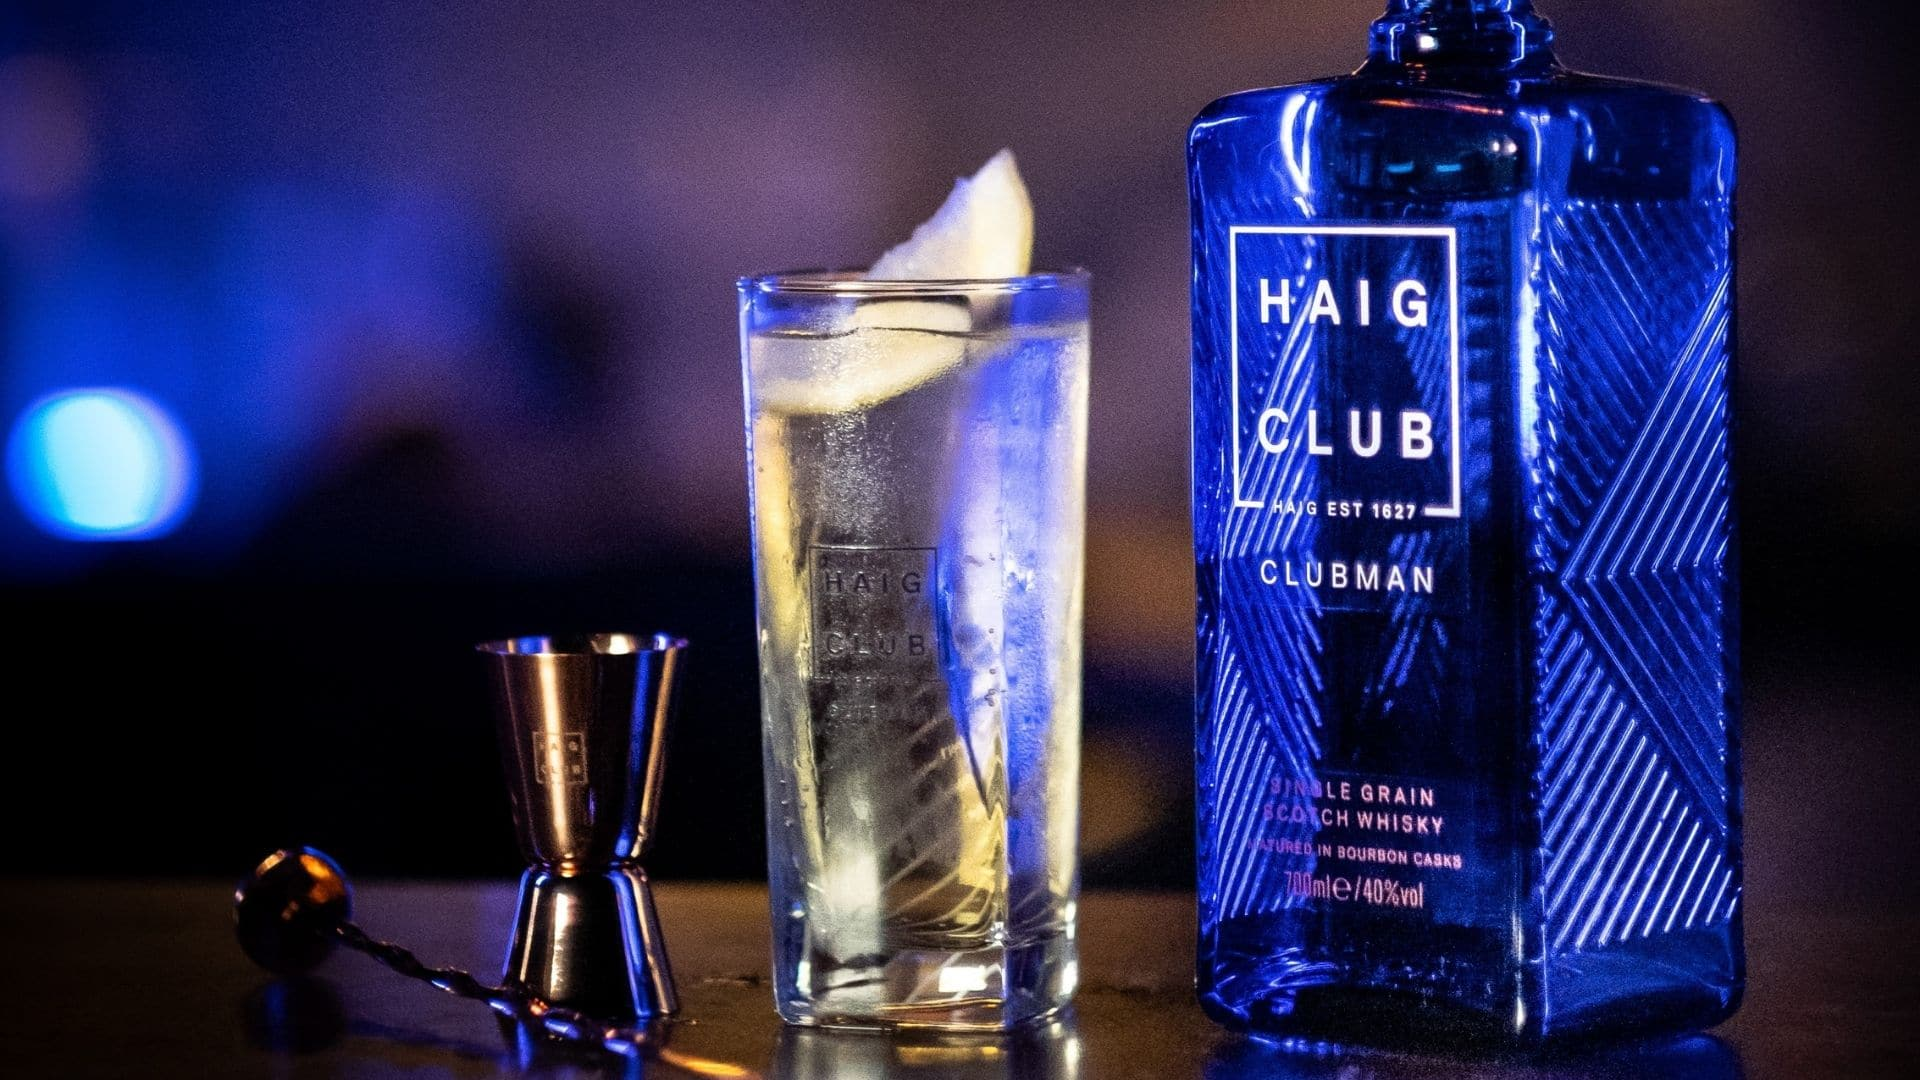 haig club cocktail lemon club citron whisky